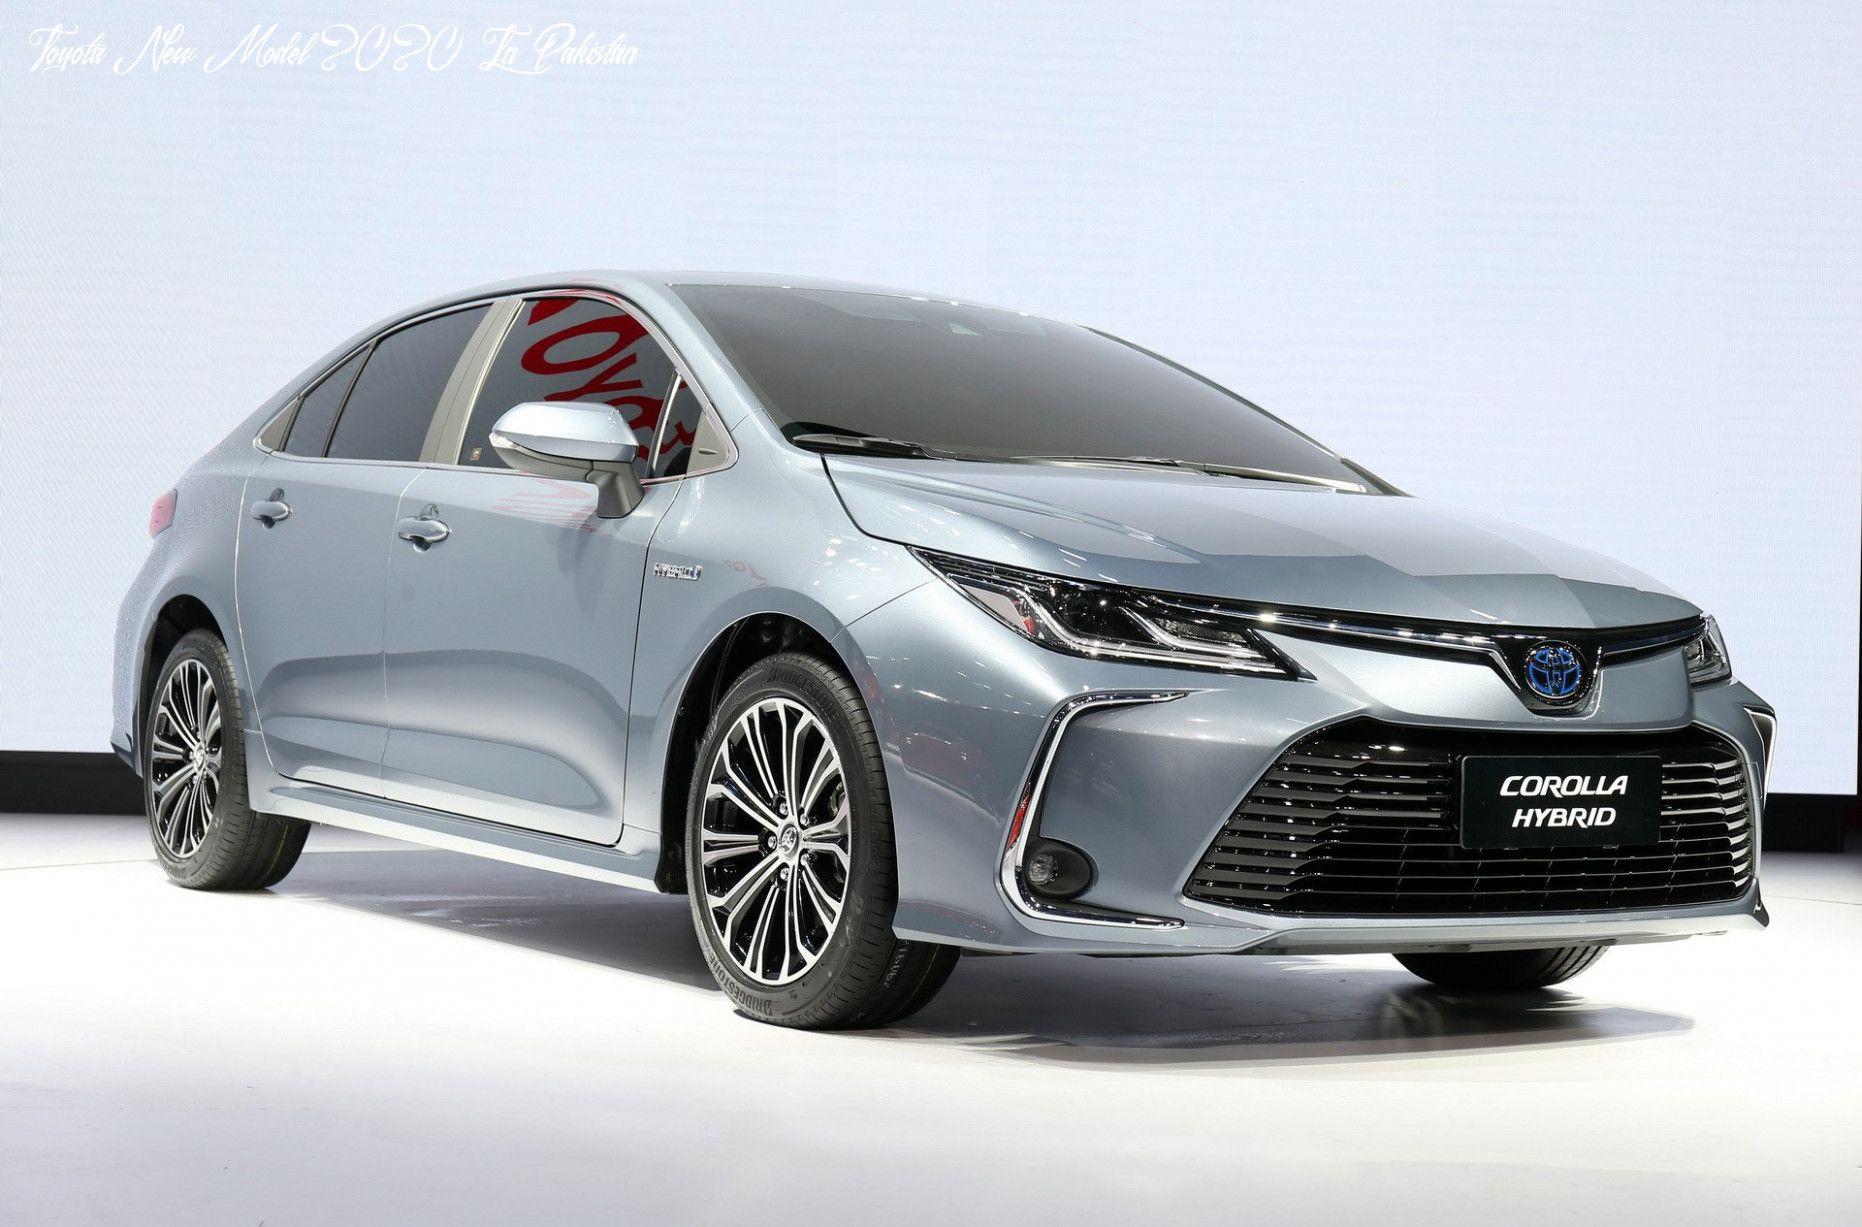 Toyota New Model 2020 In Pakistan Style In 2020 Toyota Corolla New Corolla Toyota